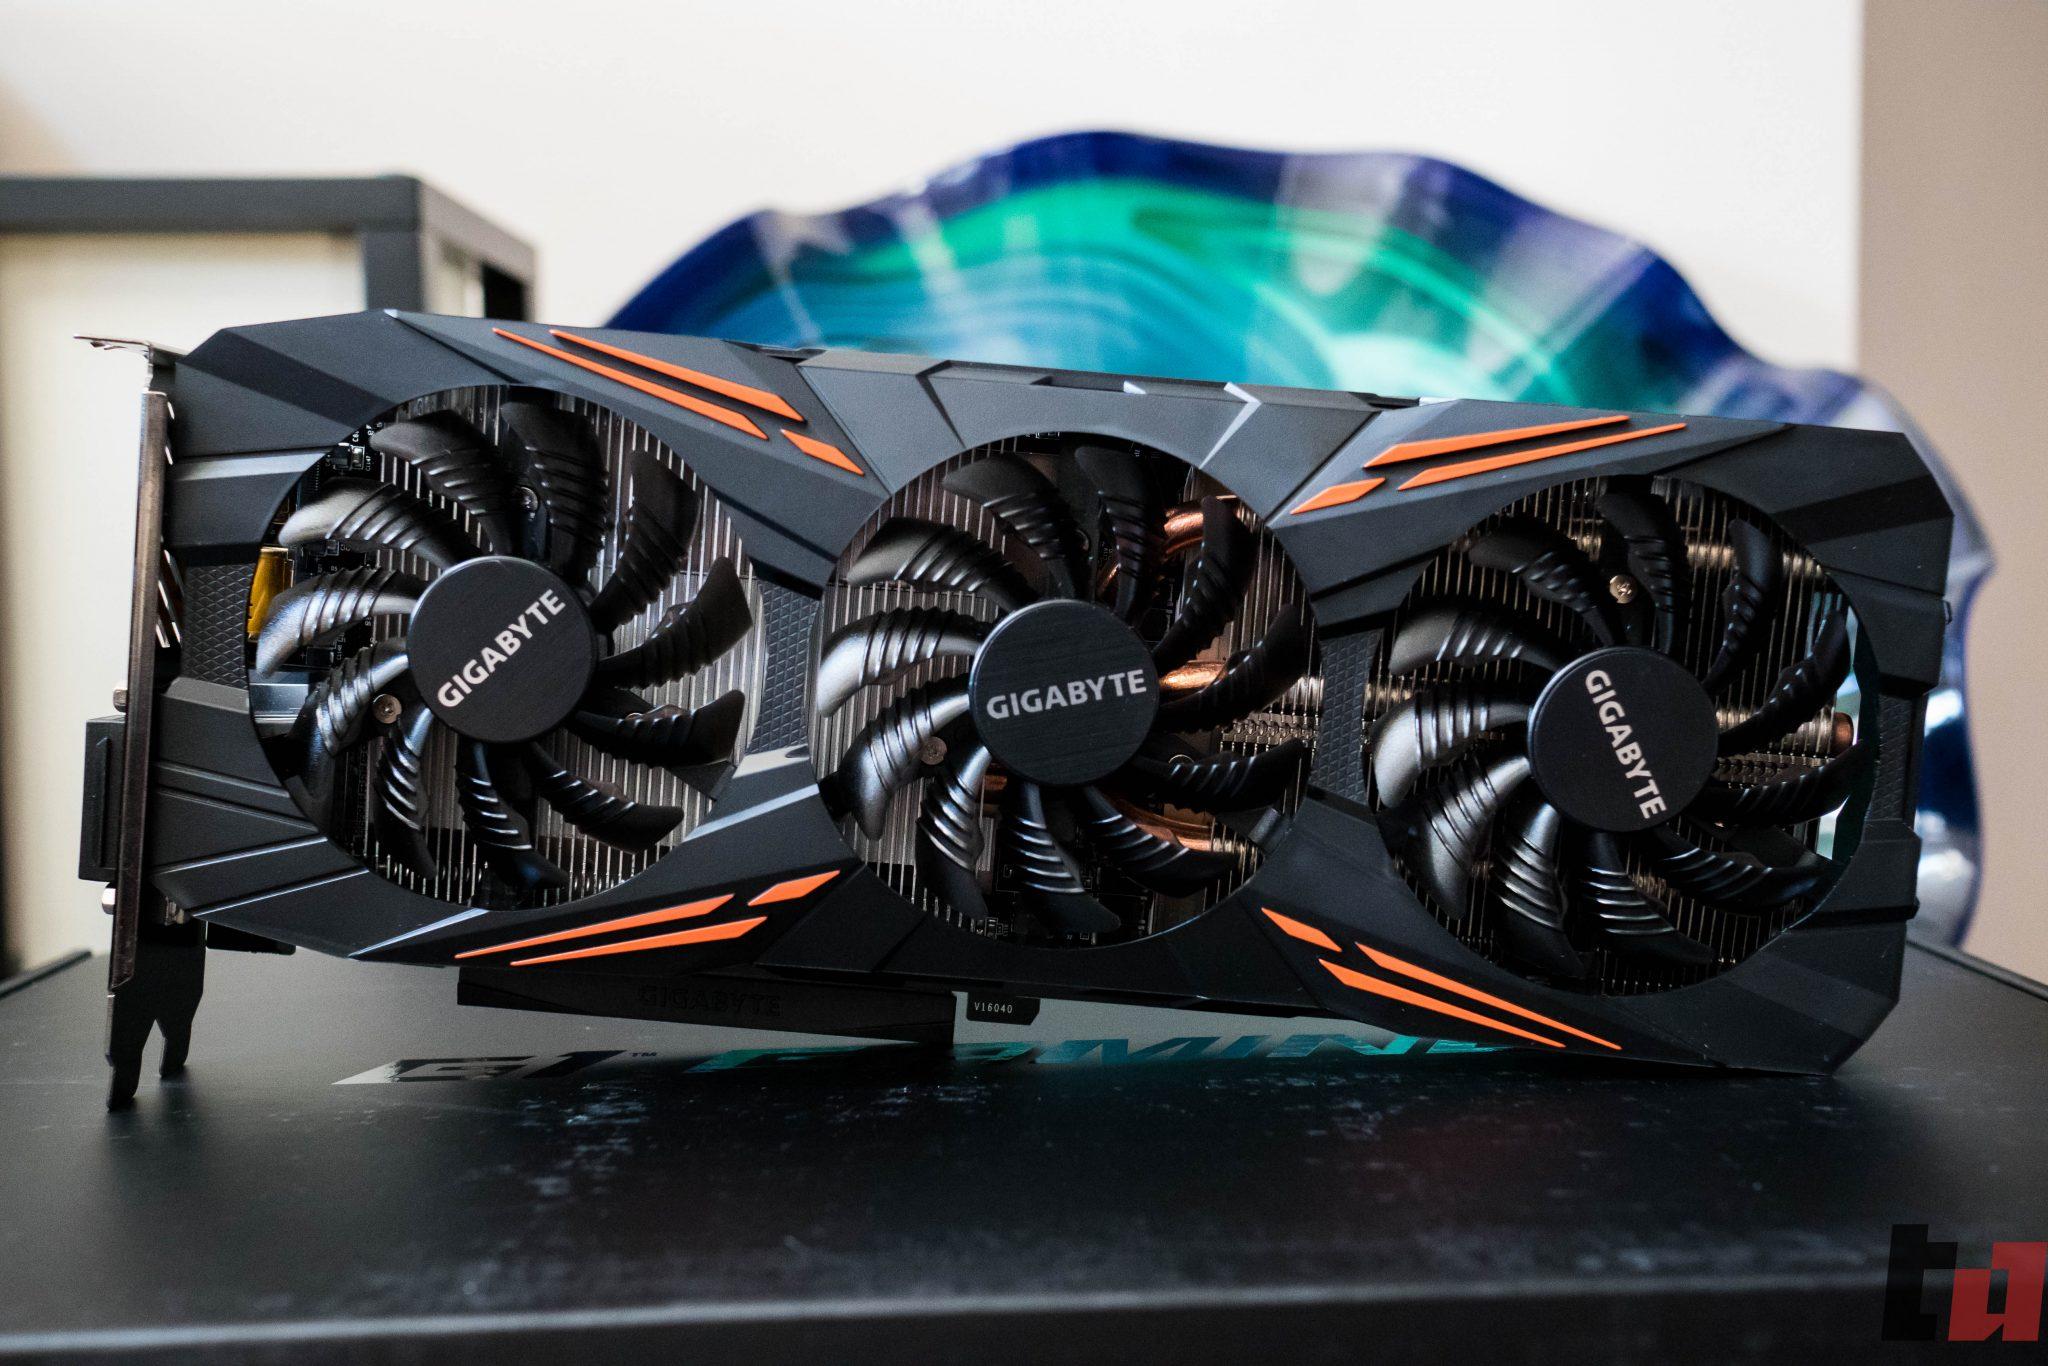 GIGABYE GeForce GTX 1080 Windforce 3X OC Capsule Review